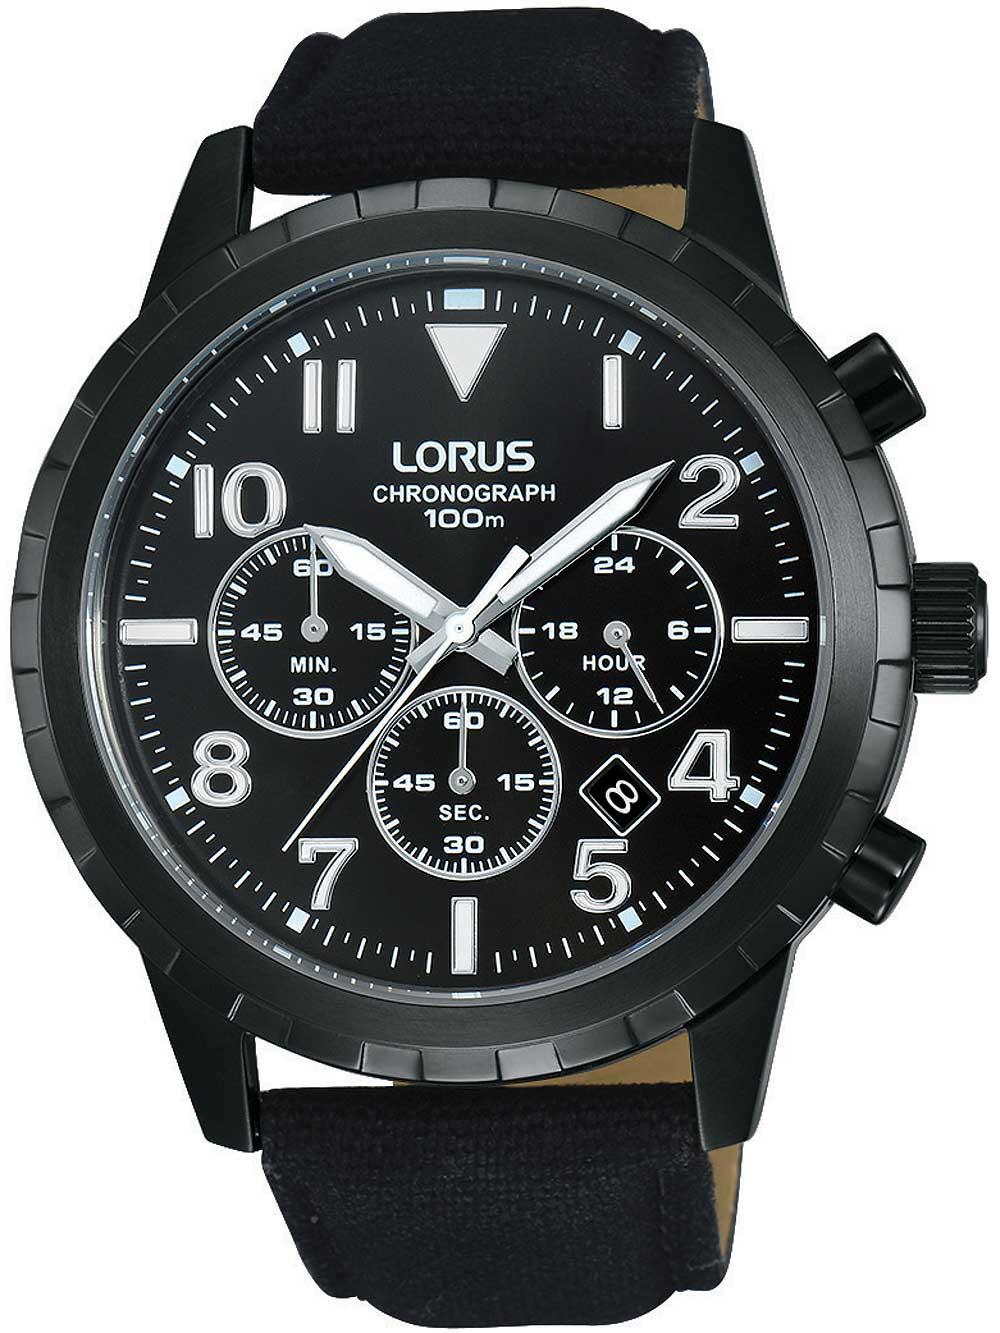 Lorus RT335FX9 Chronograph 45mm 10ATM